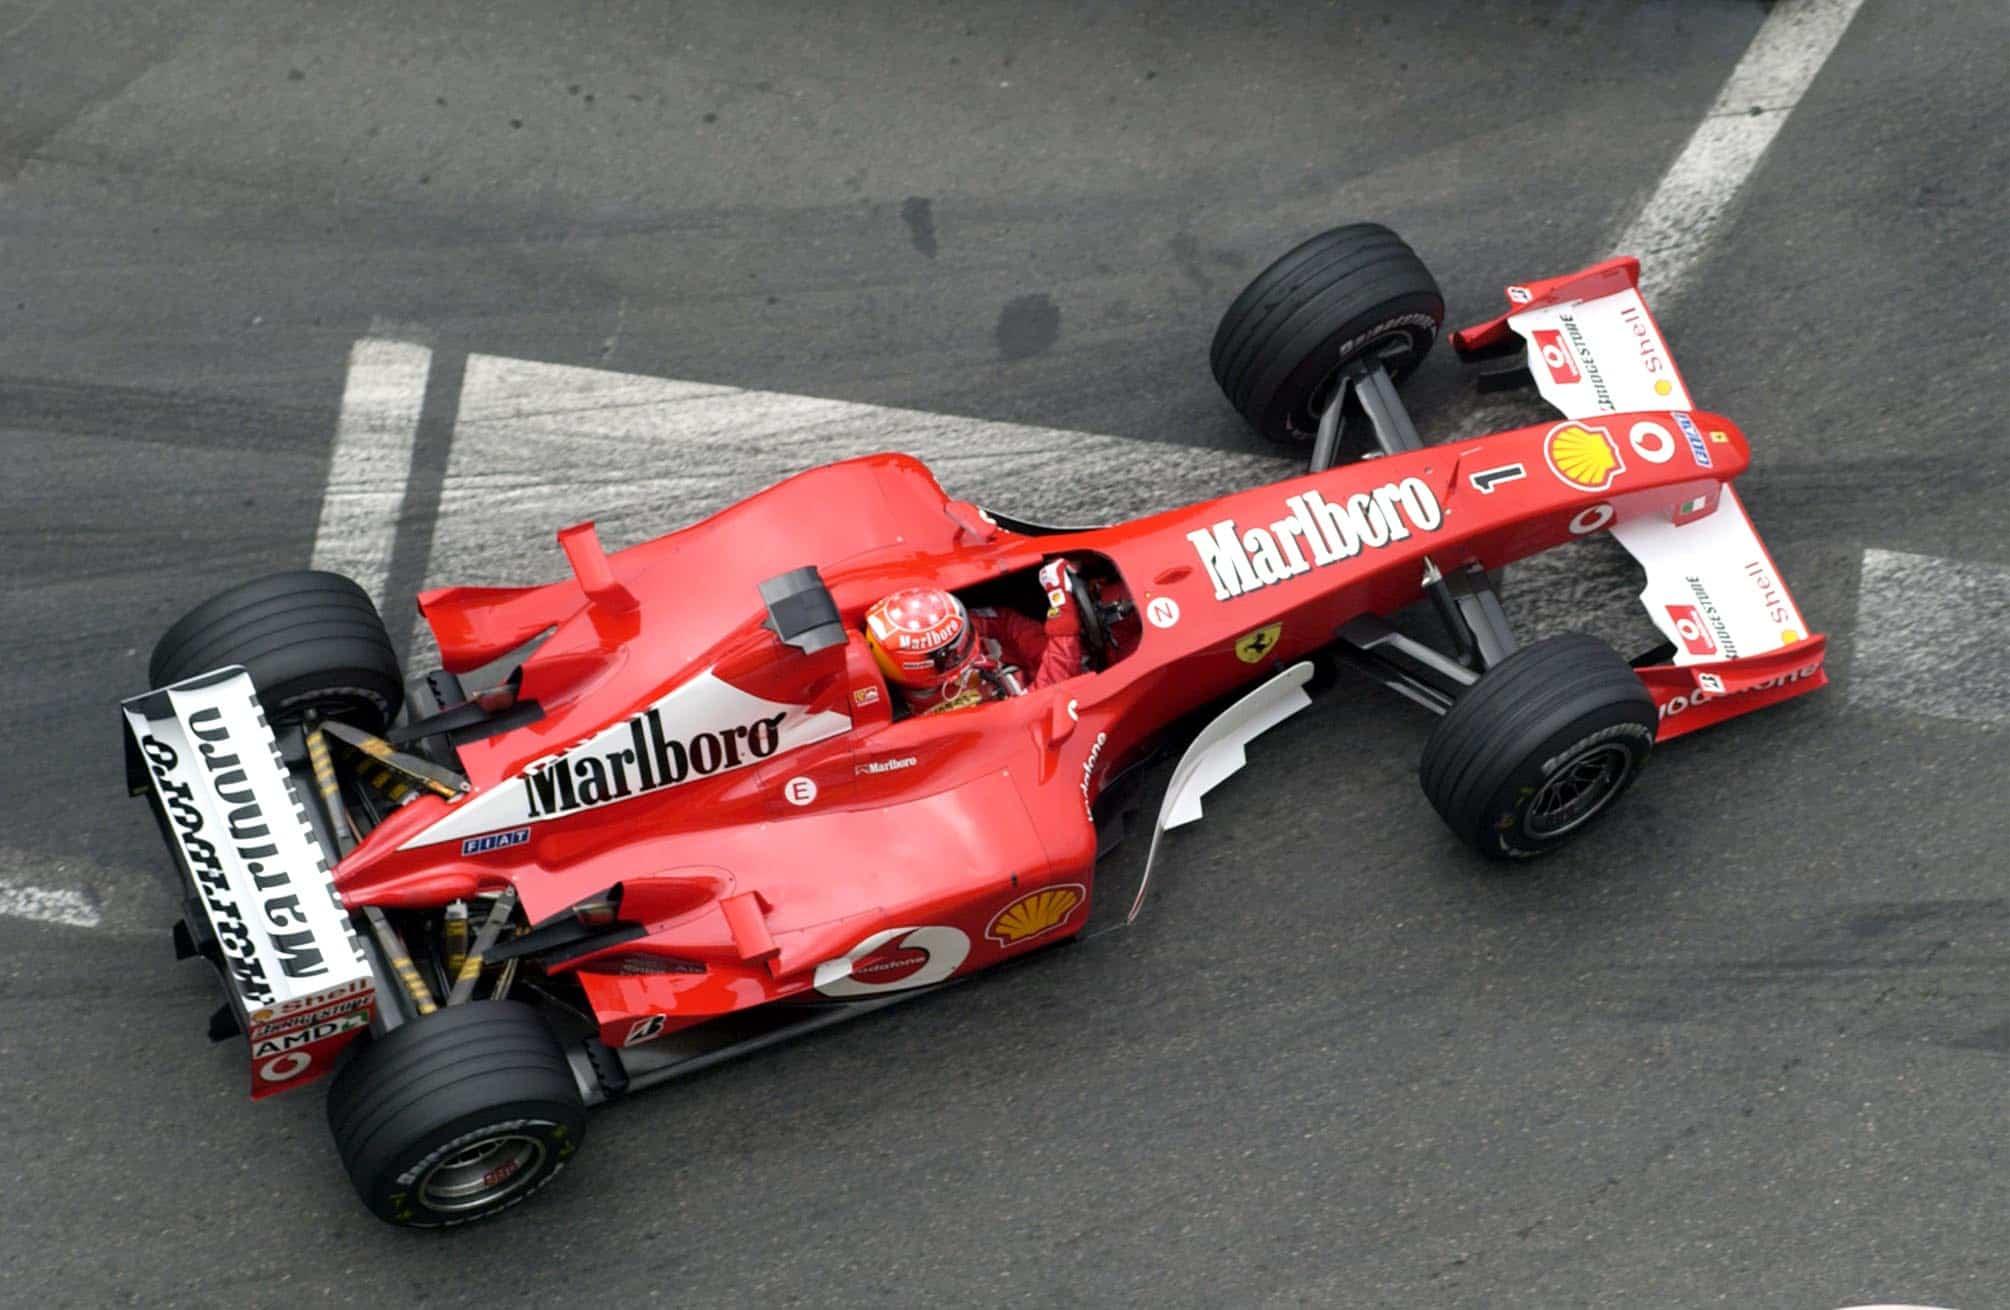 Monaco GP F1 2002 Michael Schumacher F2002 Photo Ferrari